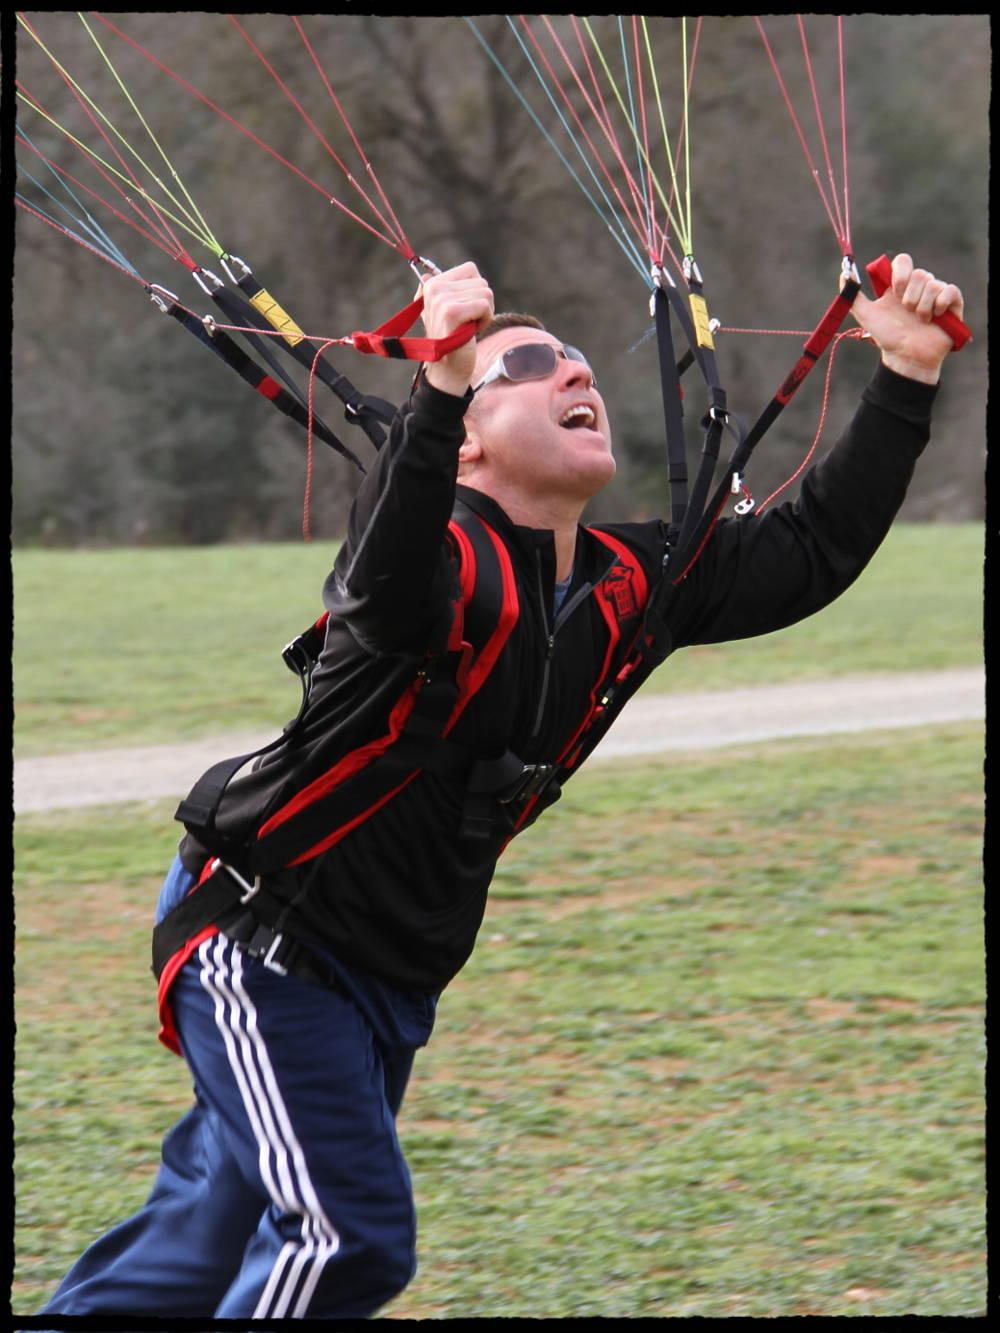 Powered Paragliding Lessons BlackHawk Paramotors